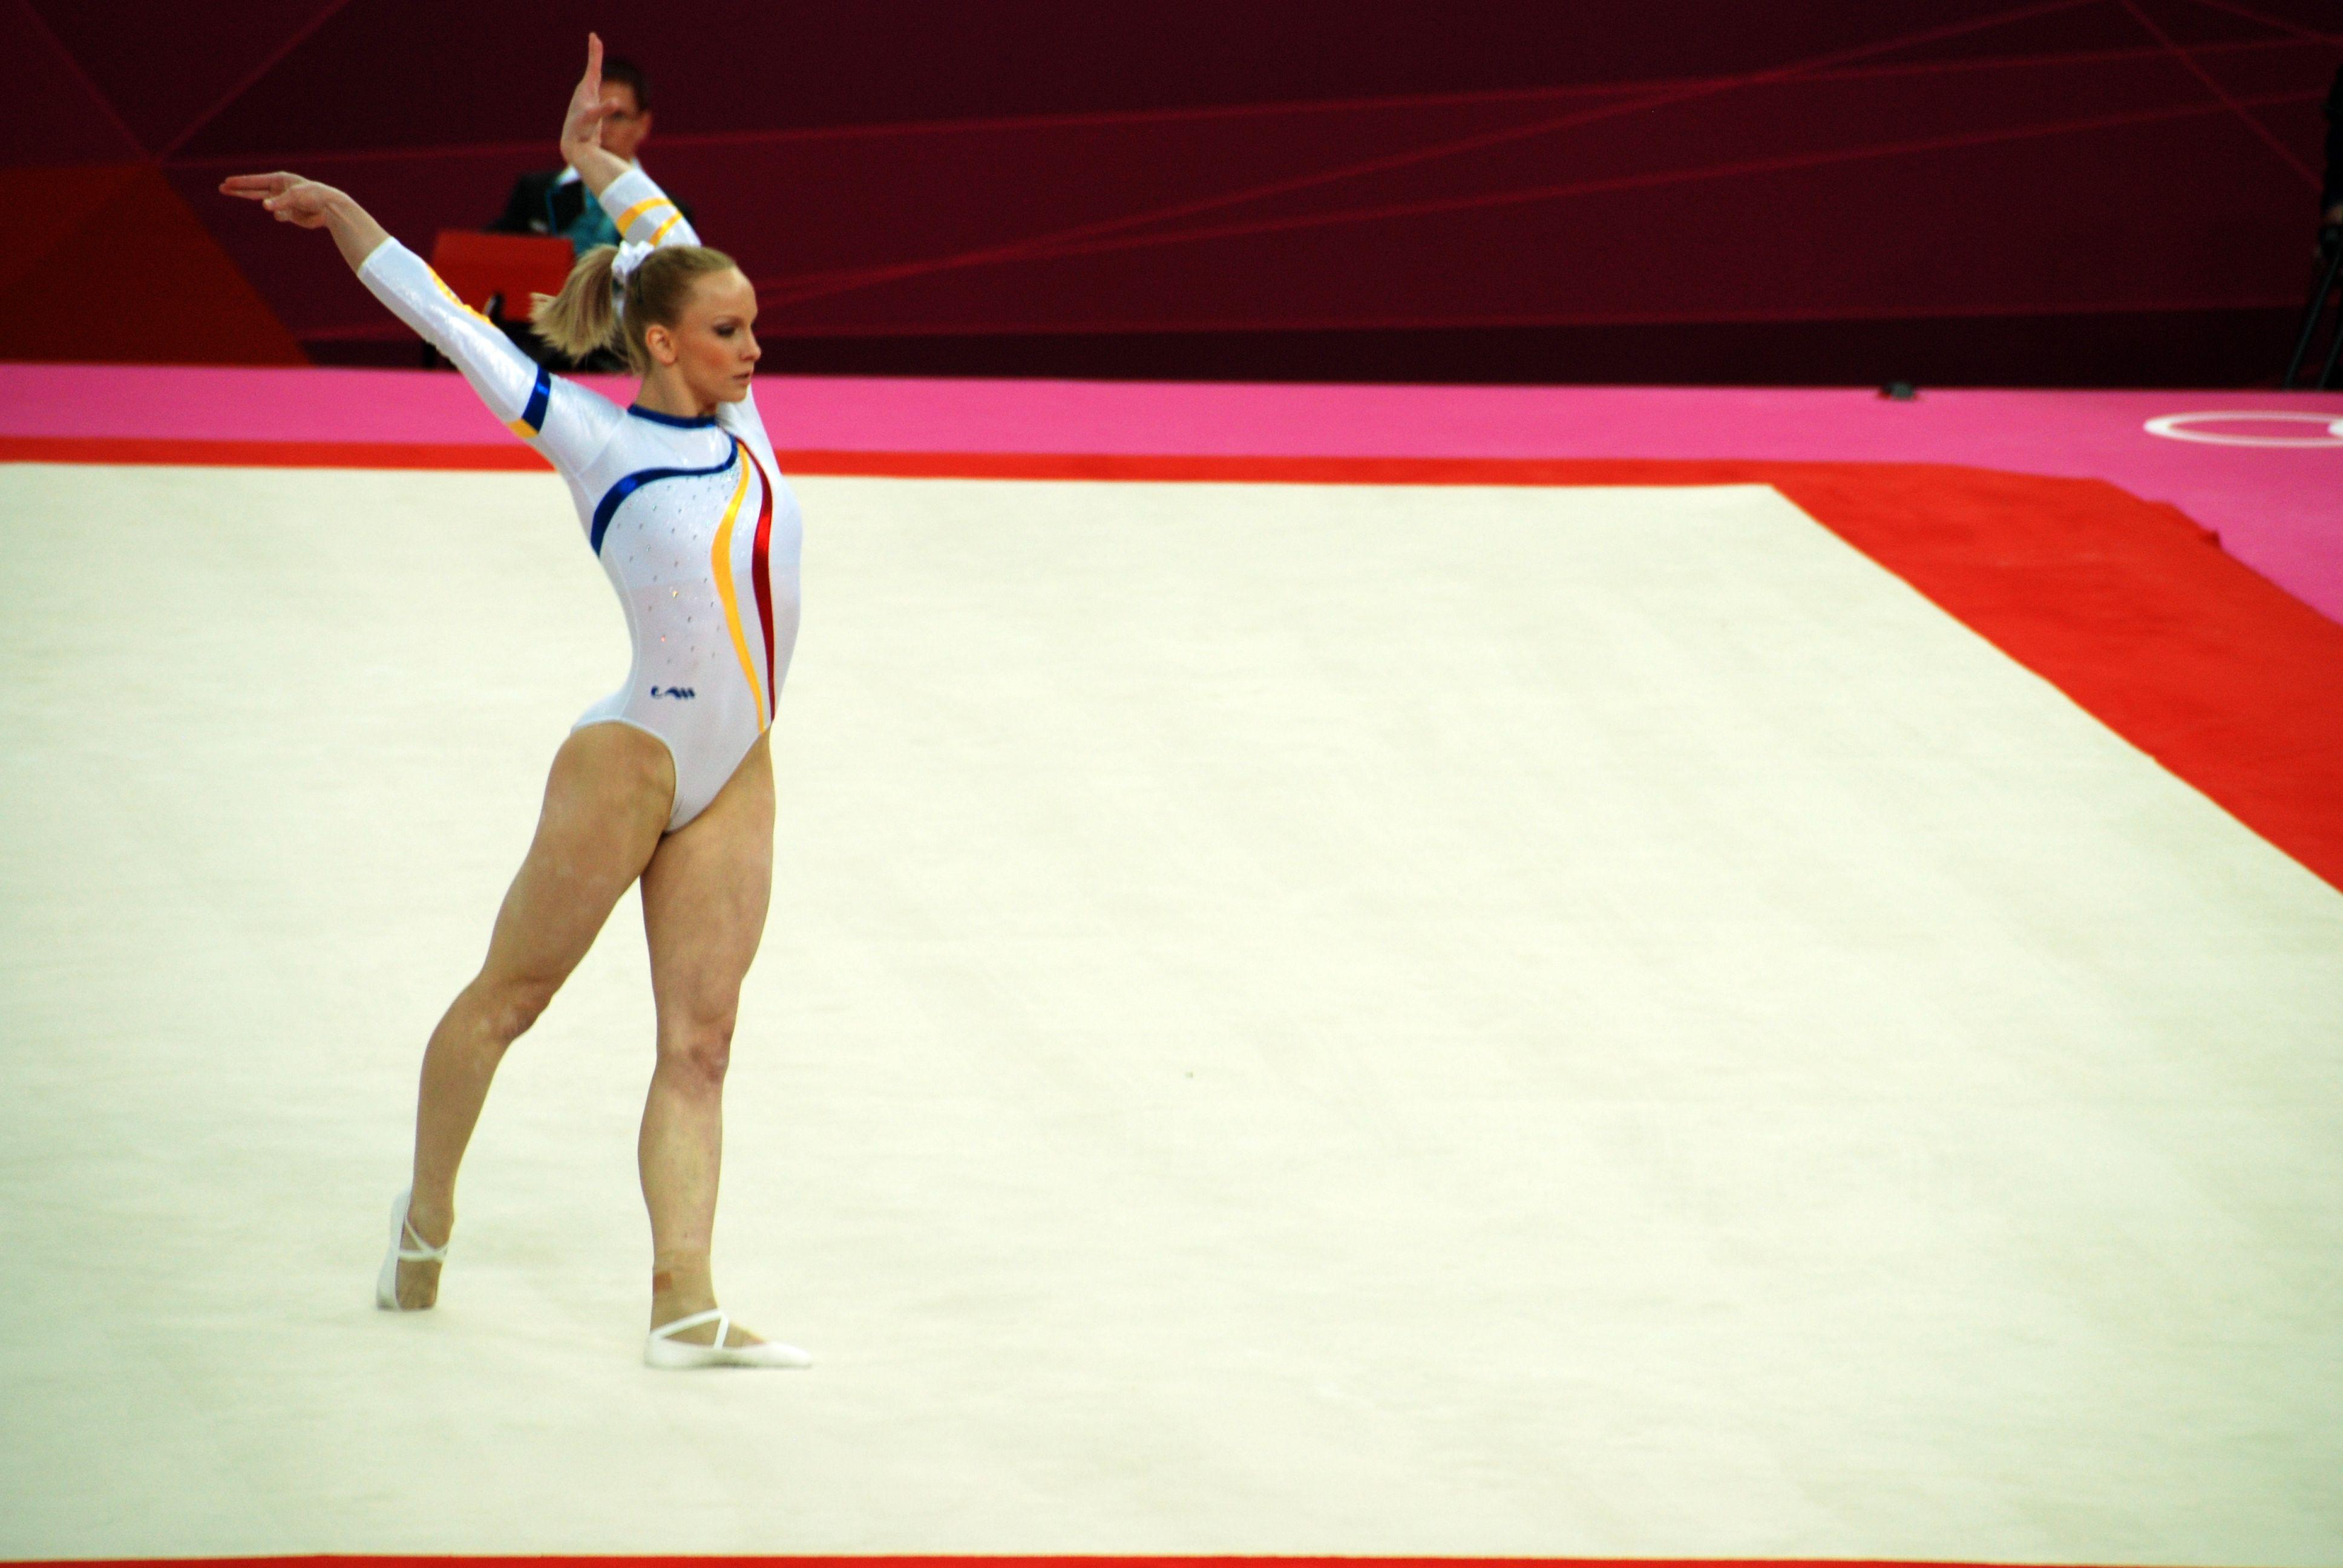 floor gymnastics olympics. Gymnastics \u2013 Elite Floor Exercise FIG Scoring Olympics